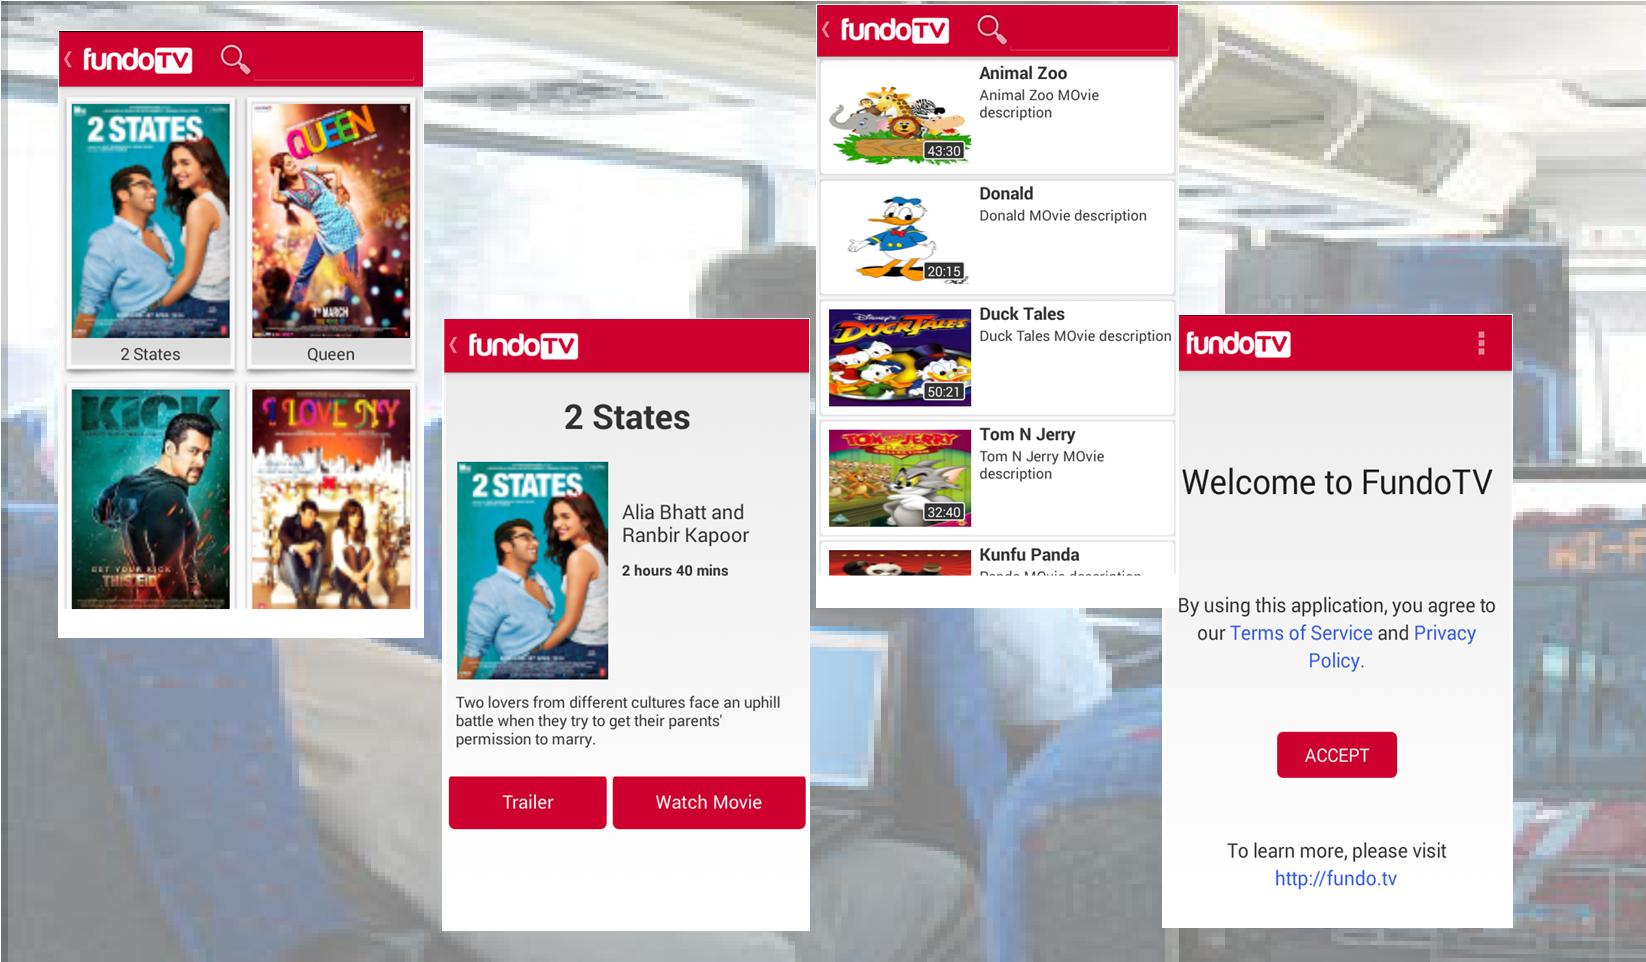 FundoTV On-board Wifi Entertainment - WifiSoft